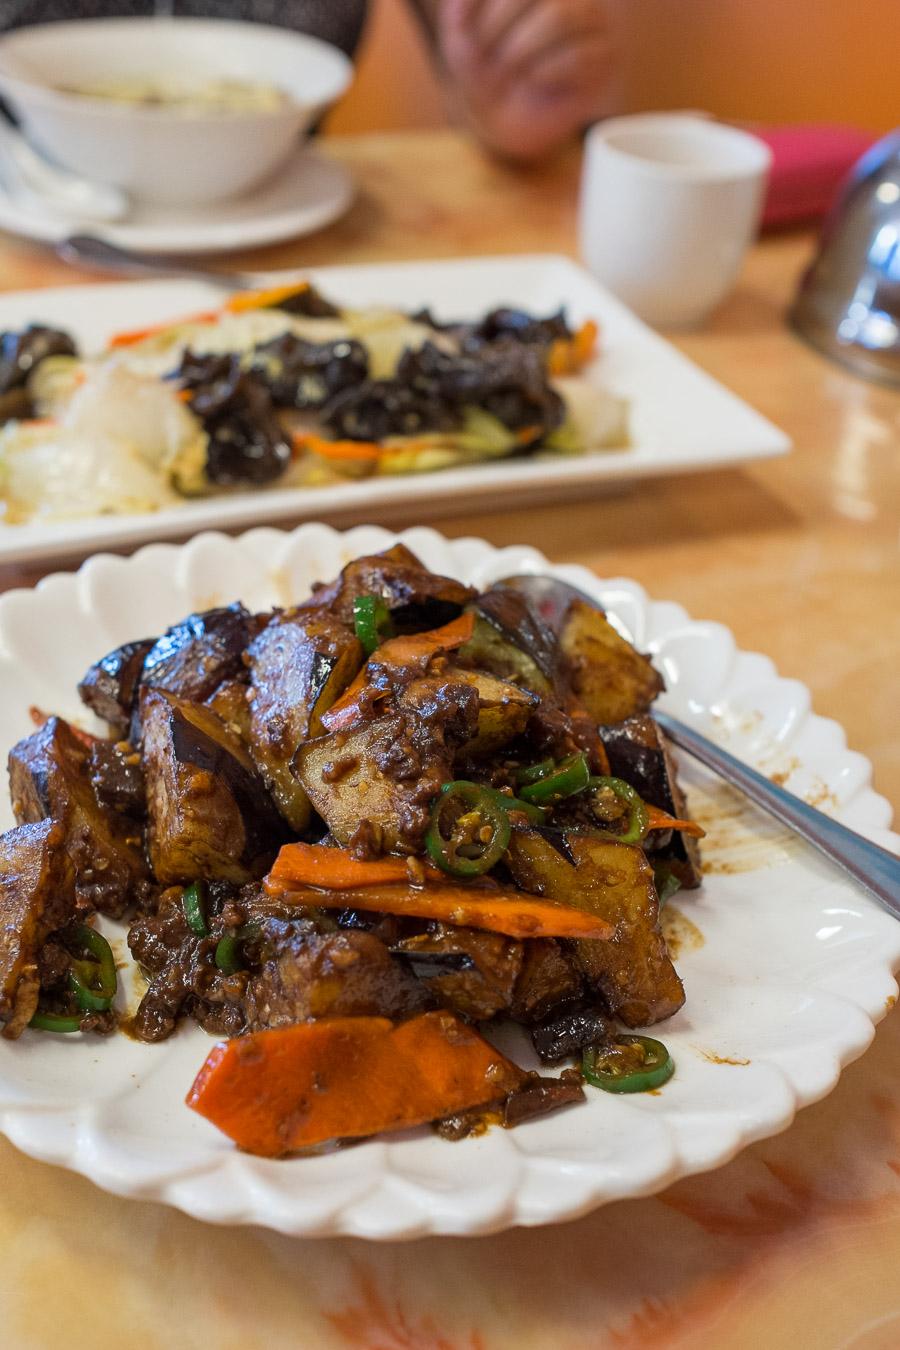 Eggplant and pork mince with brown sauce (AU$13)